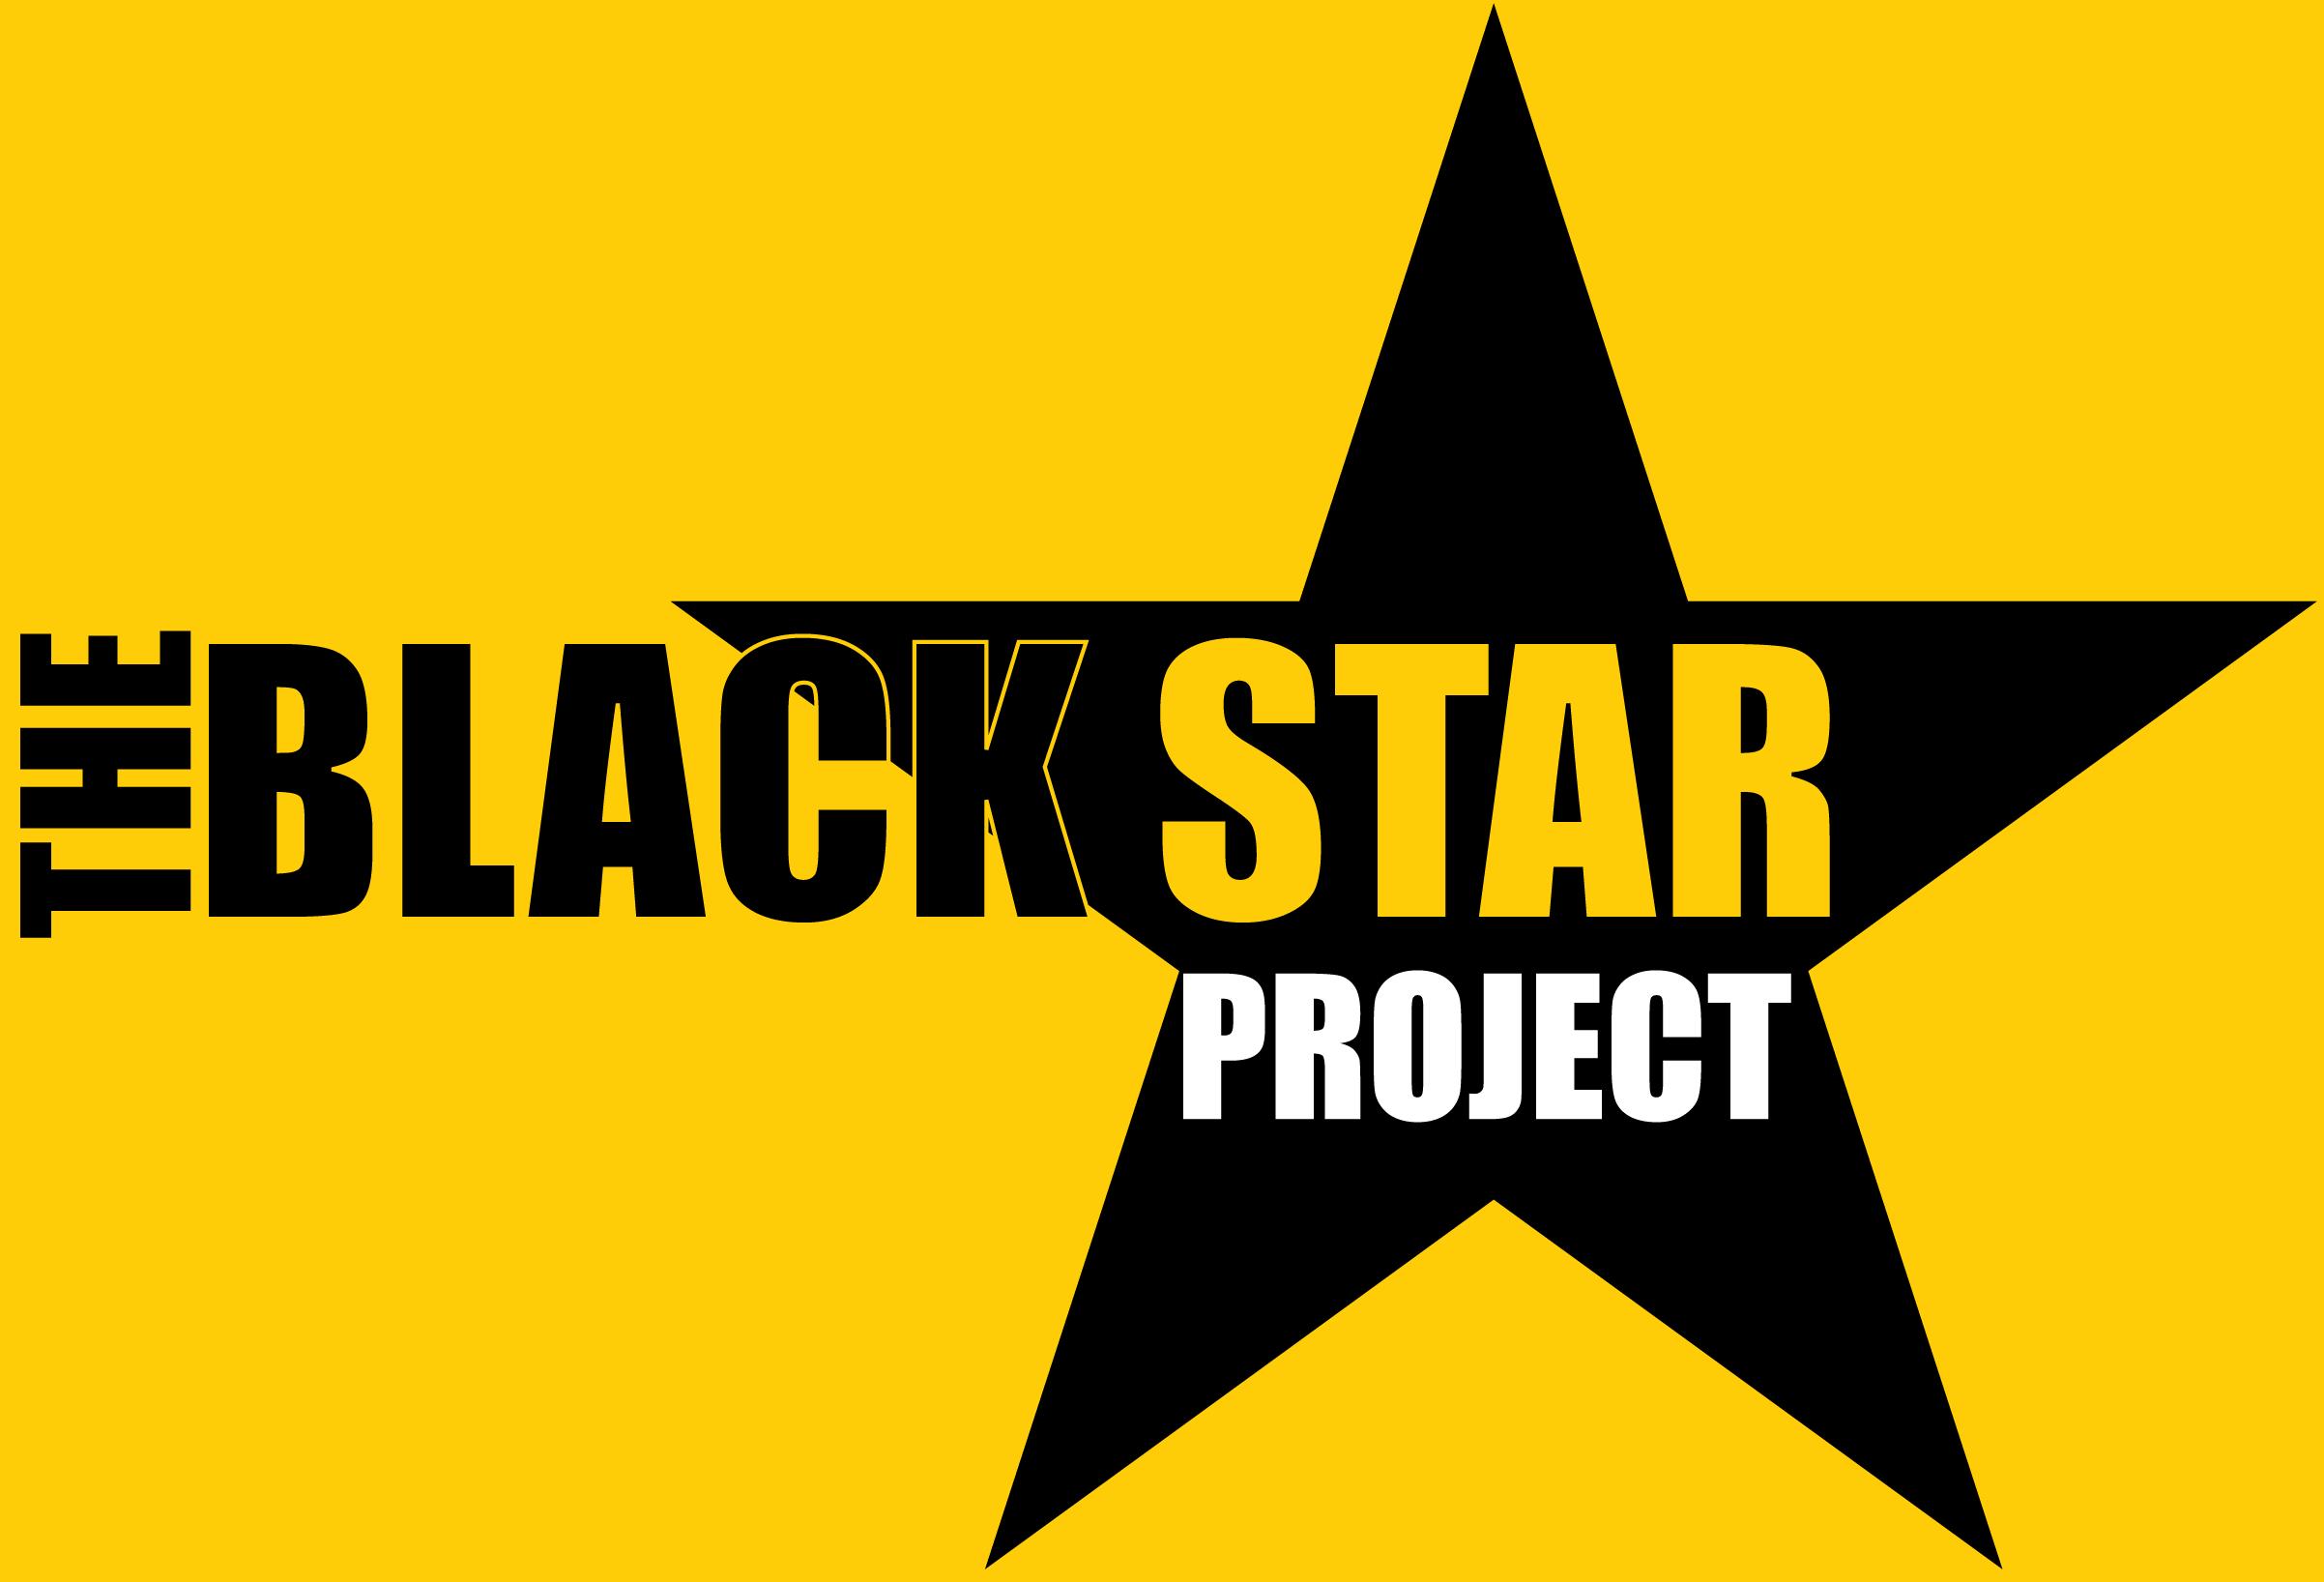 Black Star Journal